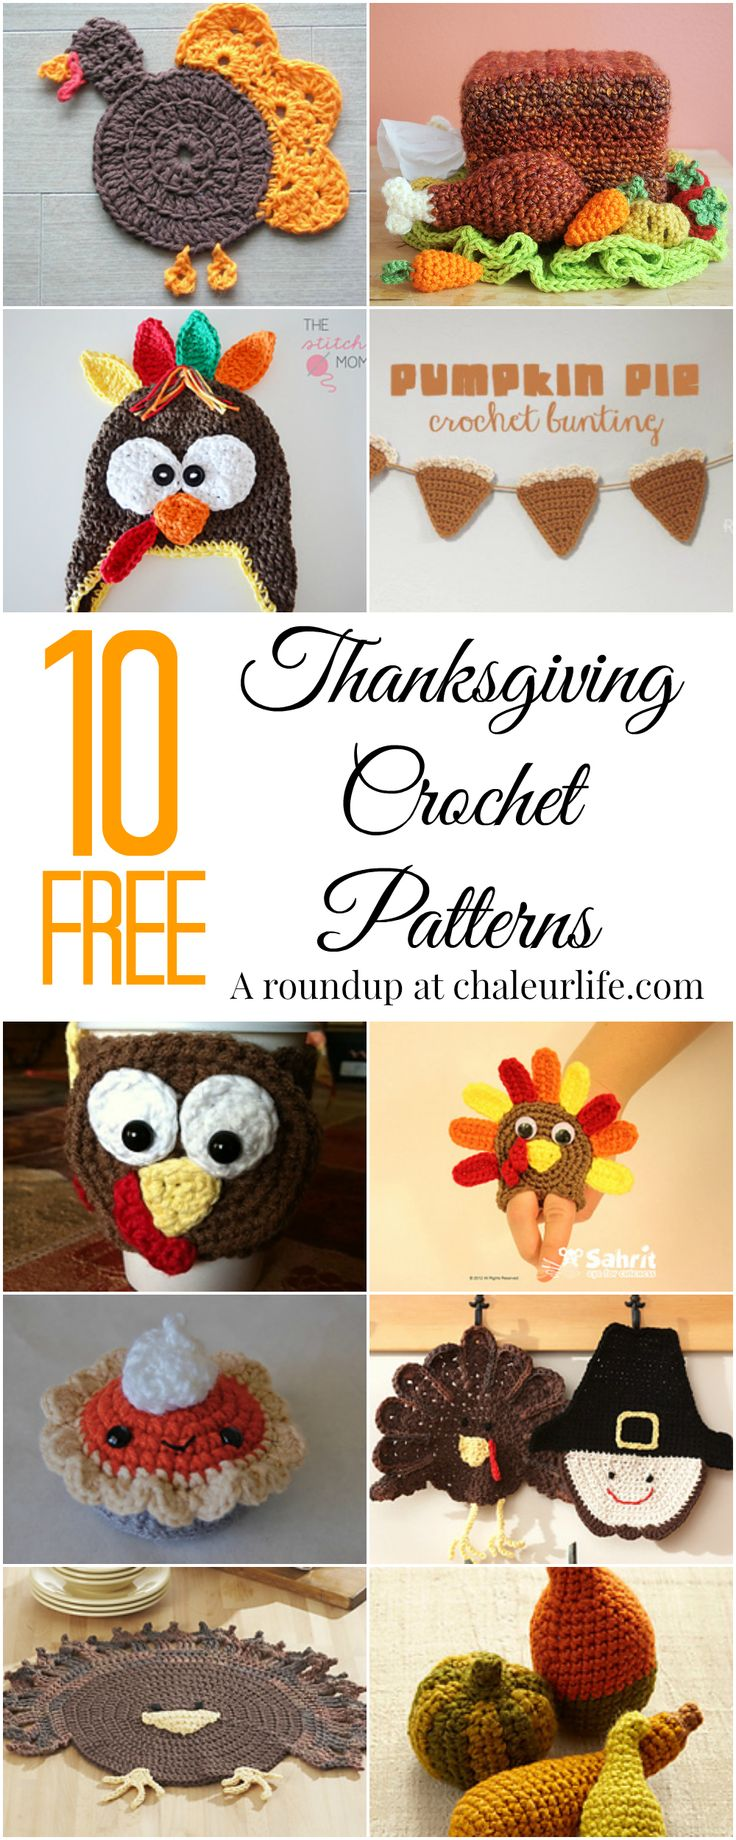 10 Free Thanksgiving Crochet Patterns   Chaleur Life